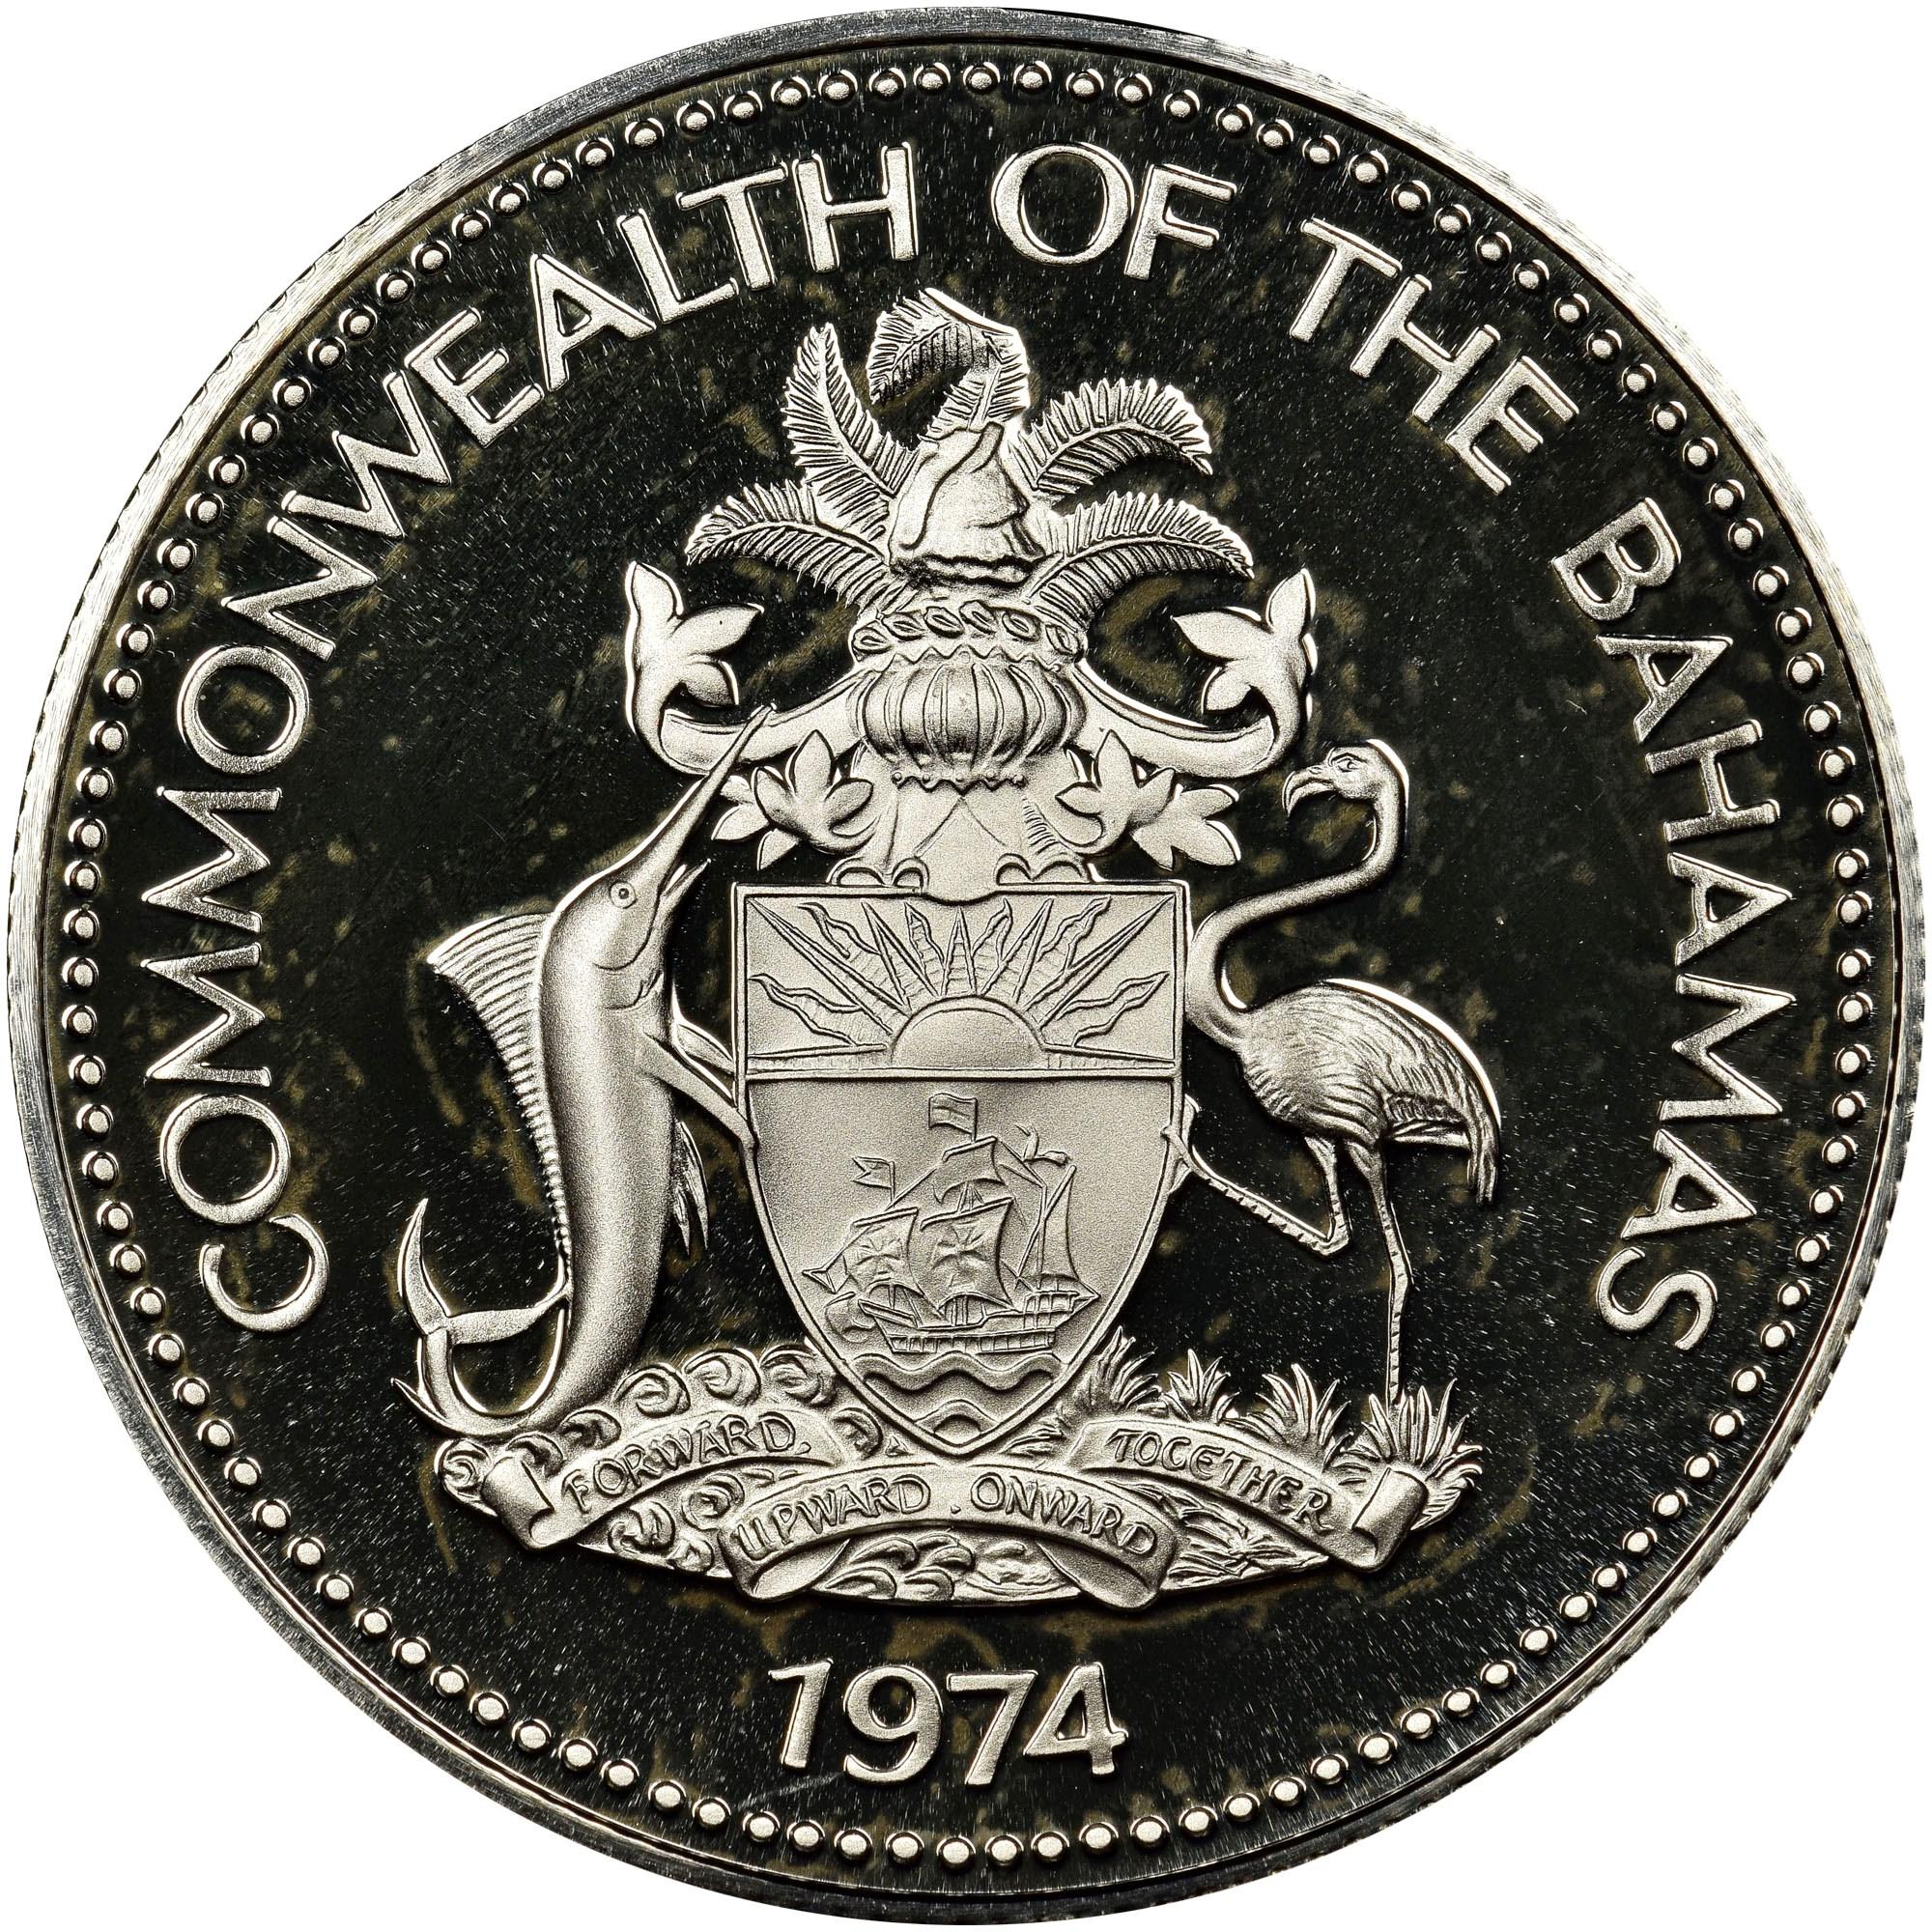 Bahamas 50 Cents obverse